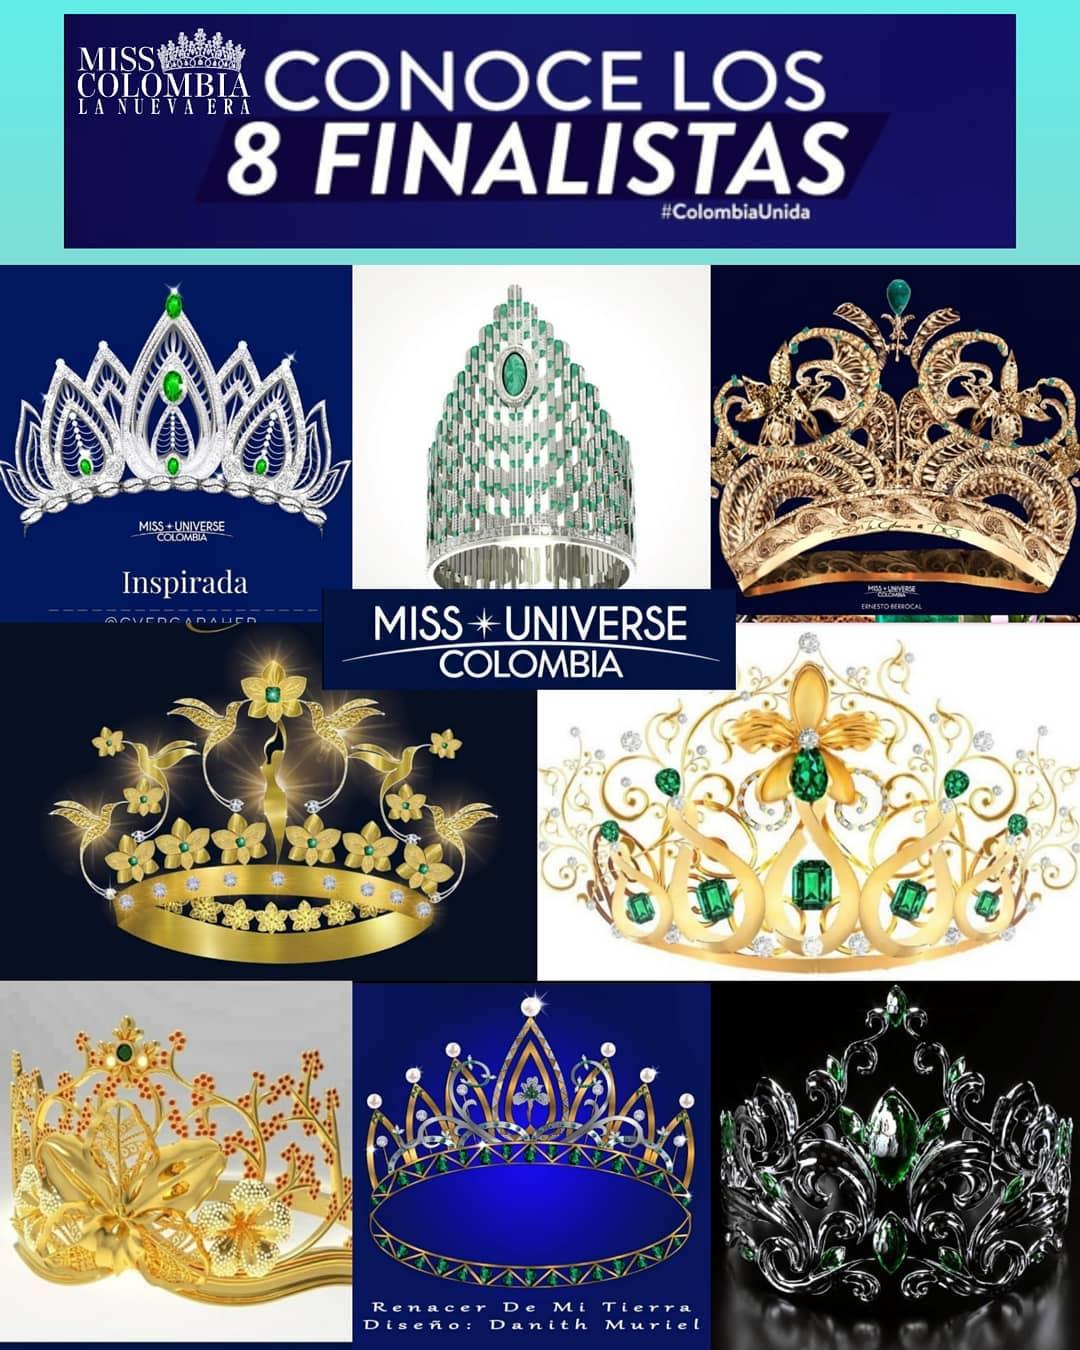 Miss Universo Colombia tiene finalistas de coronas Pstitapc